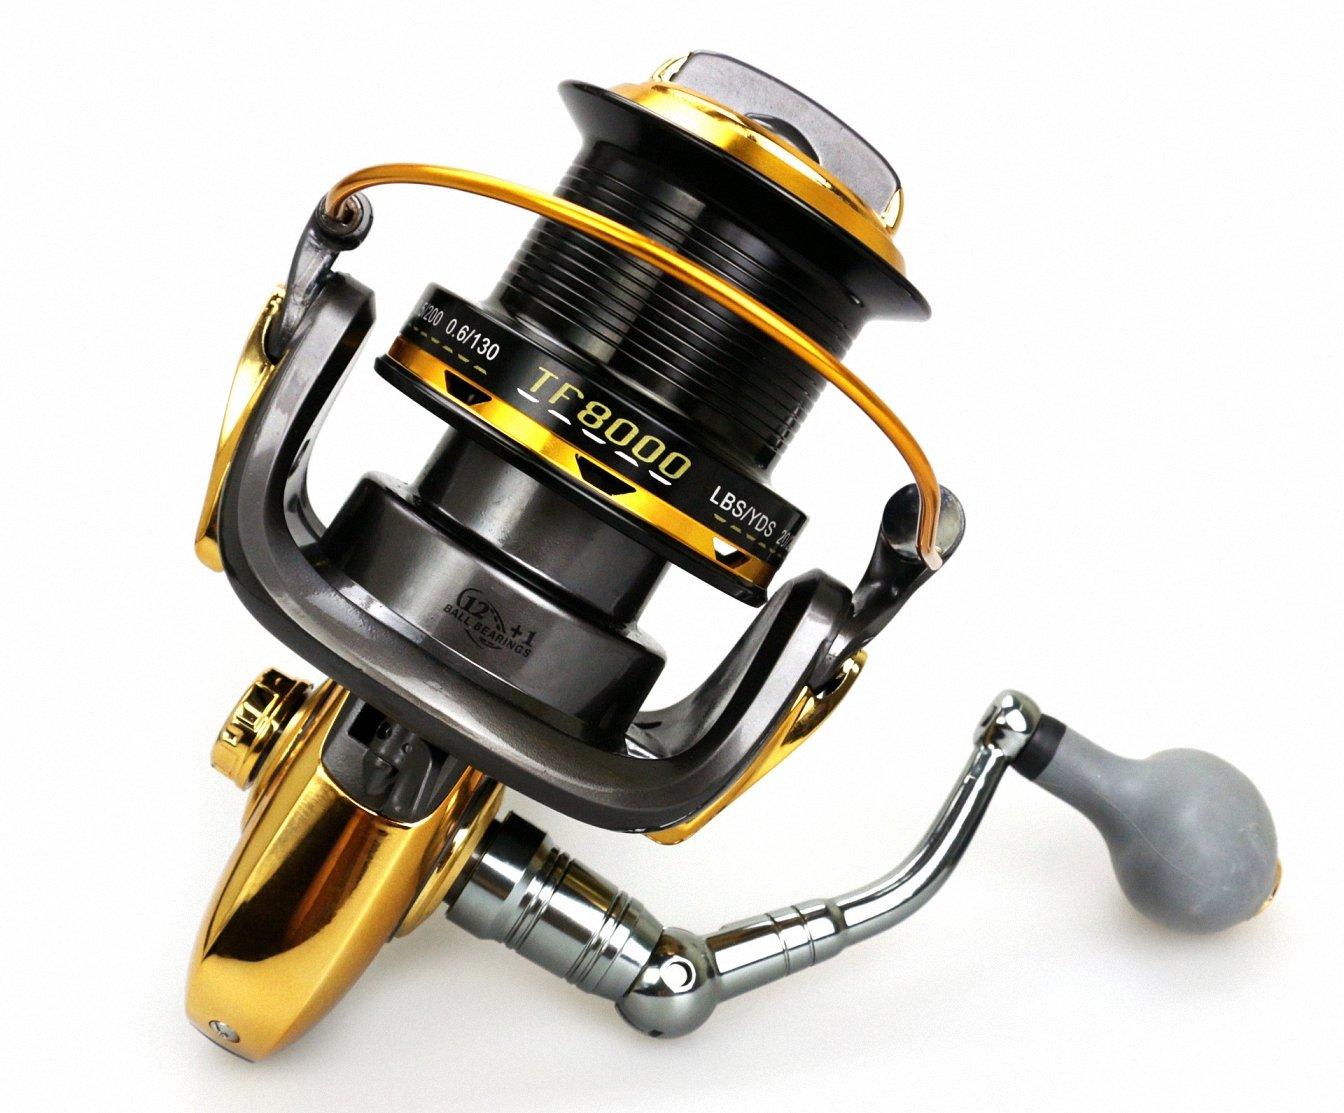 dueworkメタルスプールSpining釣りリール4.6 : 1ギア比12 + 1 BB、左/右交換可能for淡水、海水8000 9000シリーズ 9000  B01N21O2LF